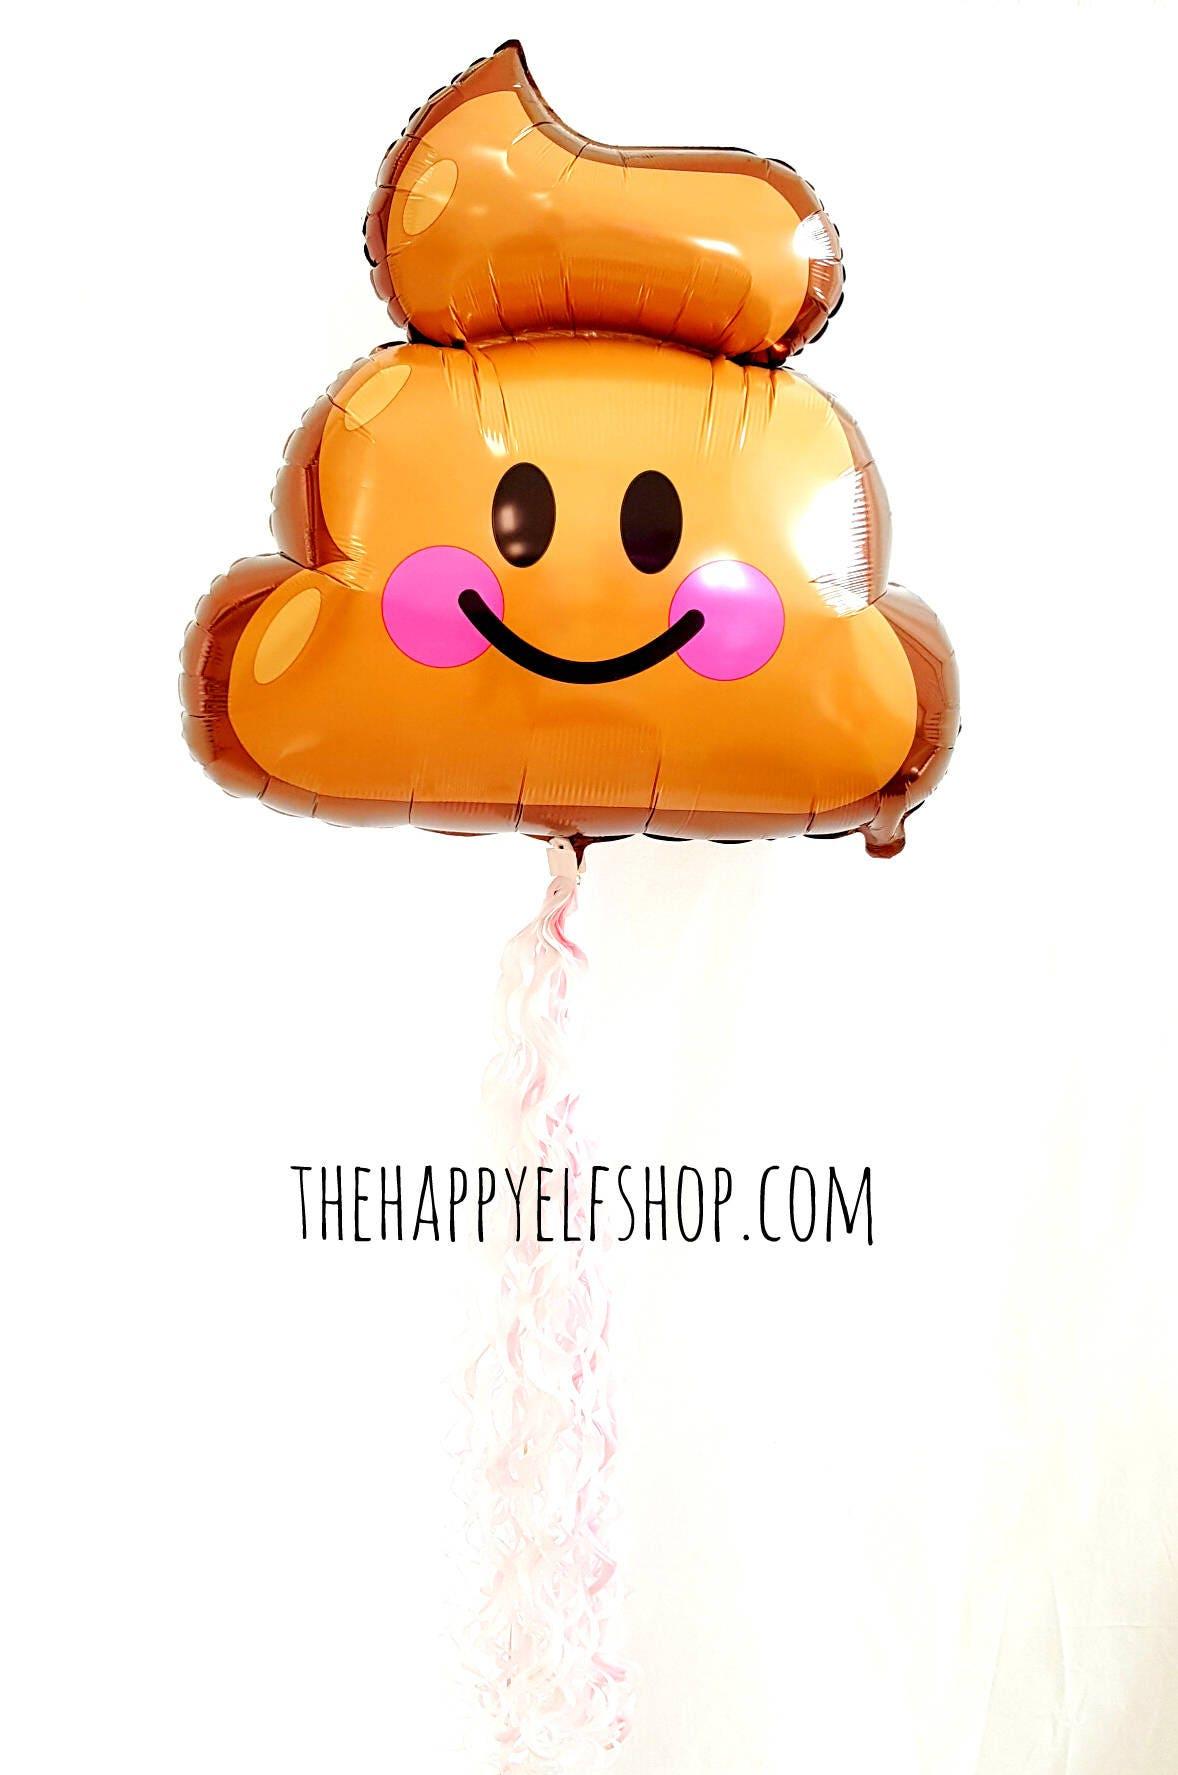 25 Poop Emoji Balloon Balloons Old Fart Kids Party Pooper